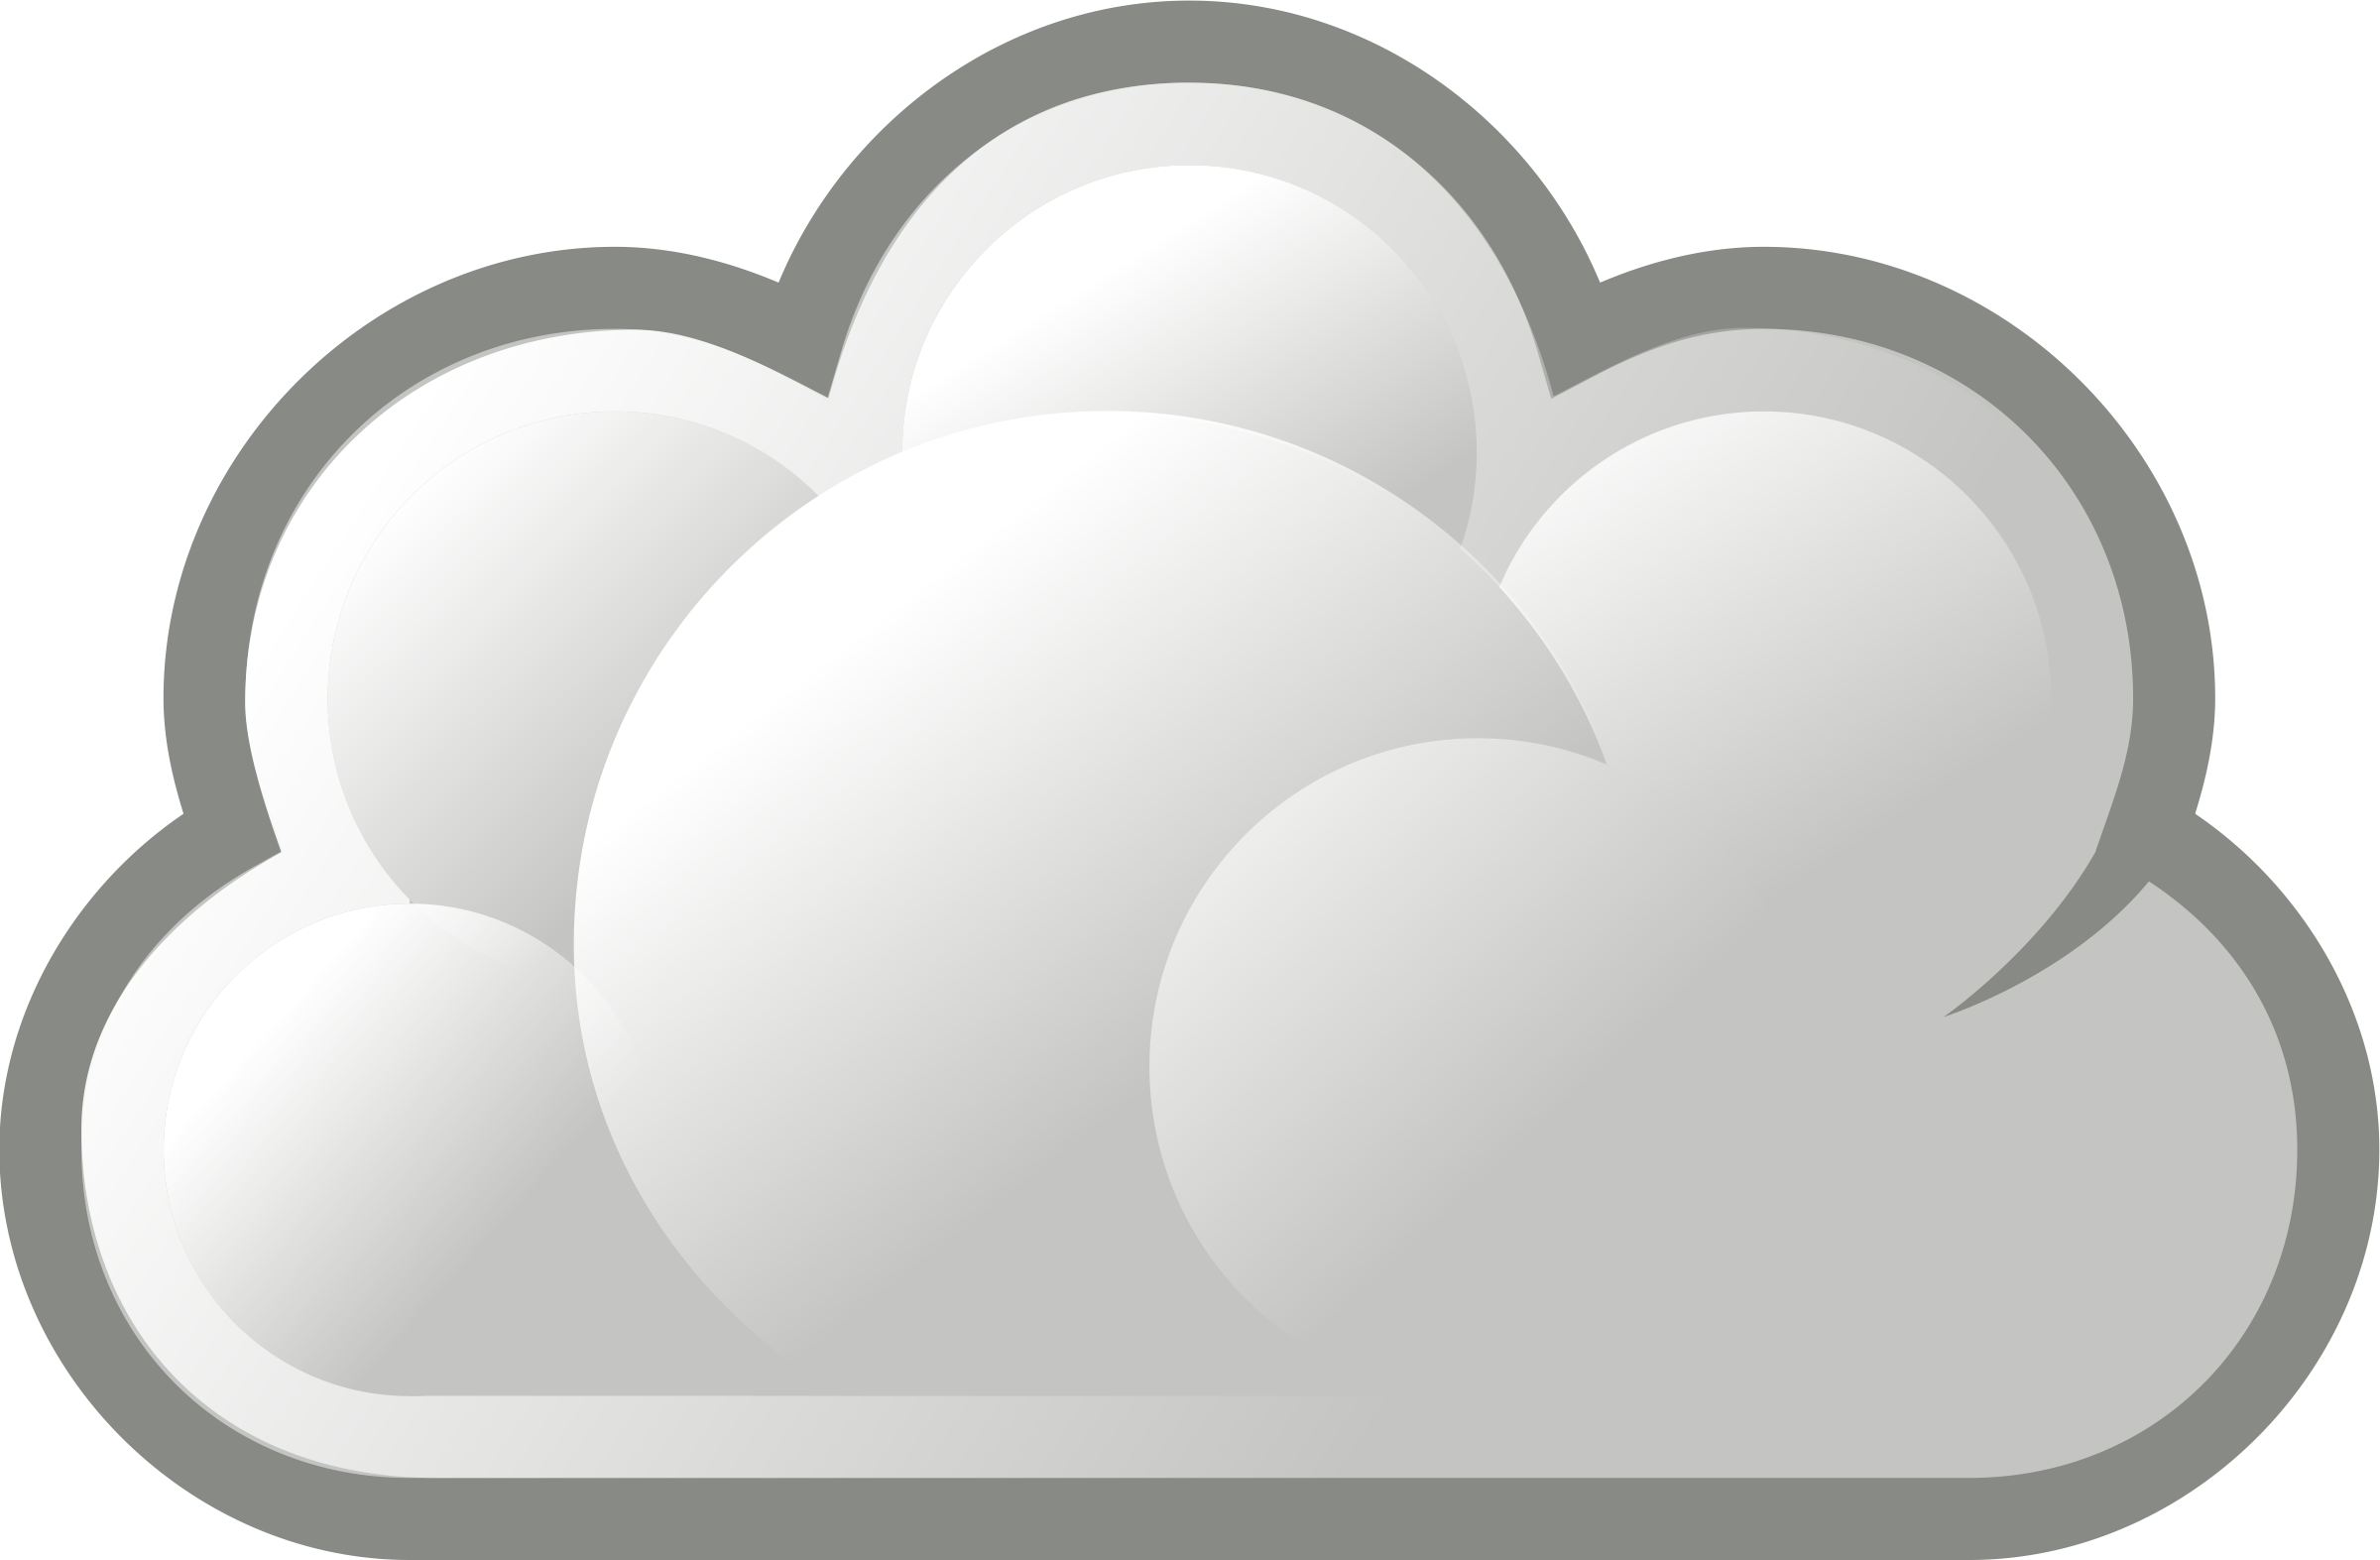 Eon altar update cloud. Clipart clouds bunch